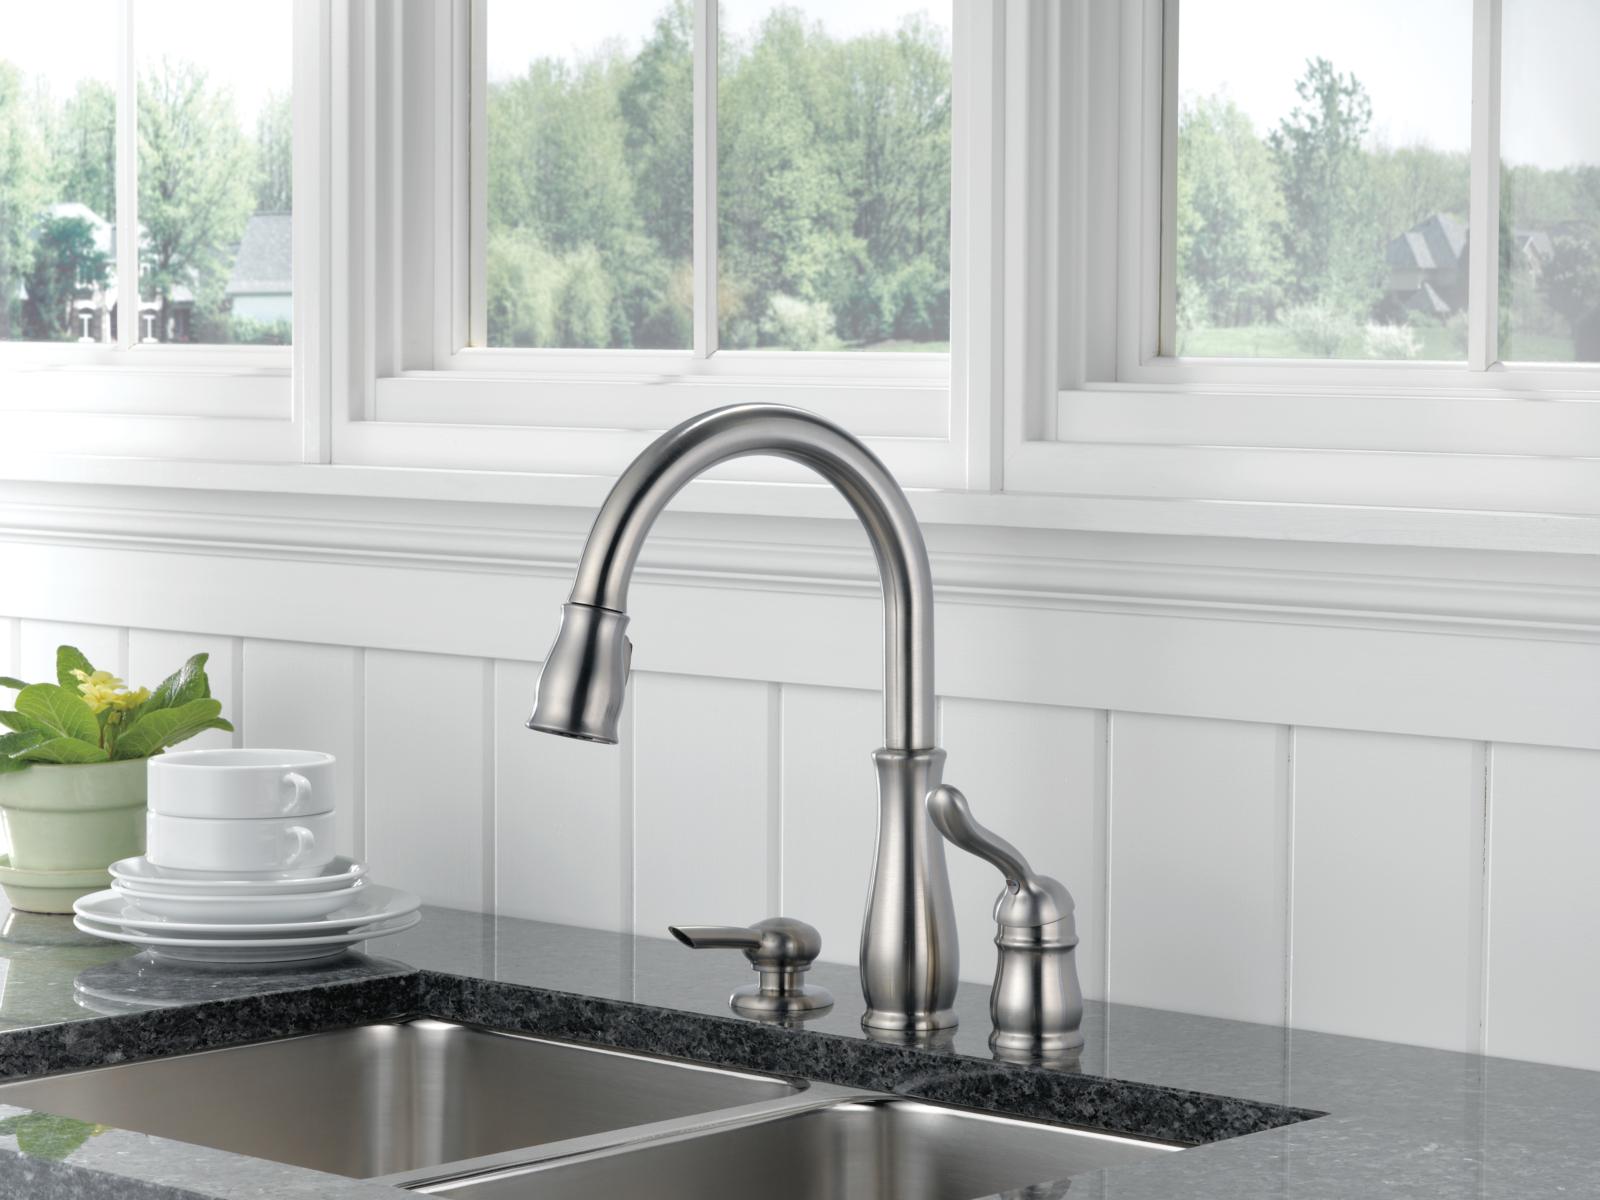 Splendid Delta Leland Kitchen Faucet 18